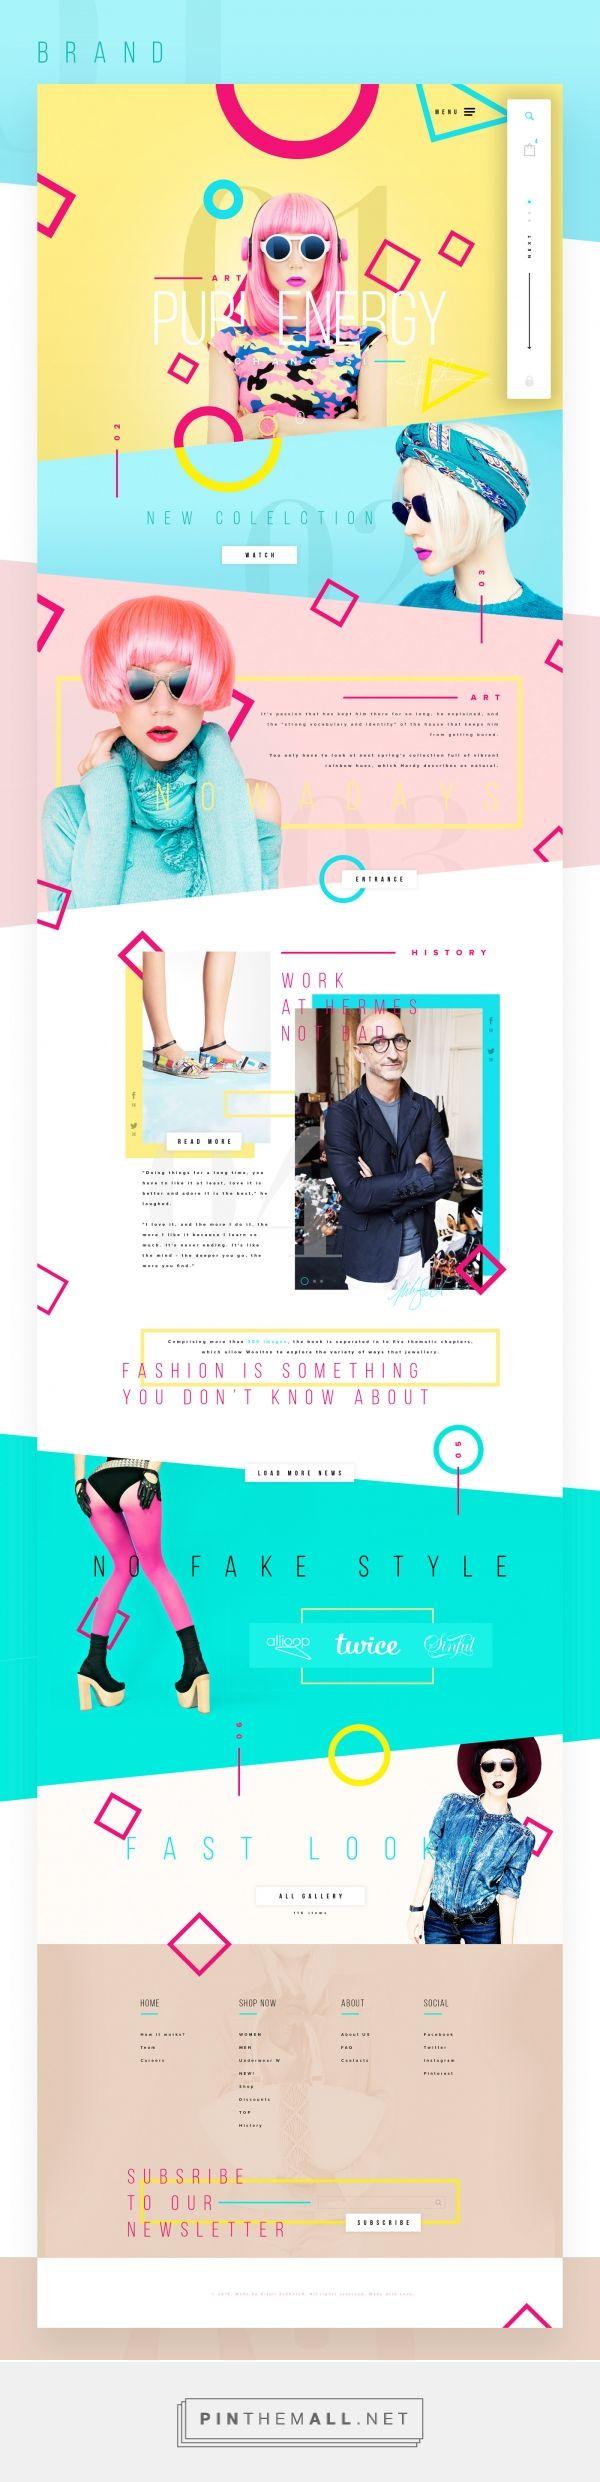 Fashion History Shop Web Design by Vitali Zahharov   Fivestar Branding Agency – Design and Branding Agency & Curated Inspiration Gallery